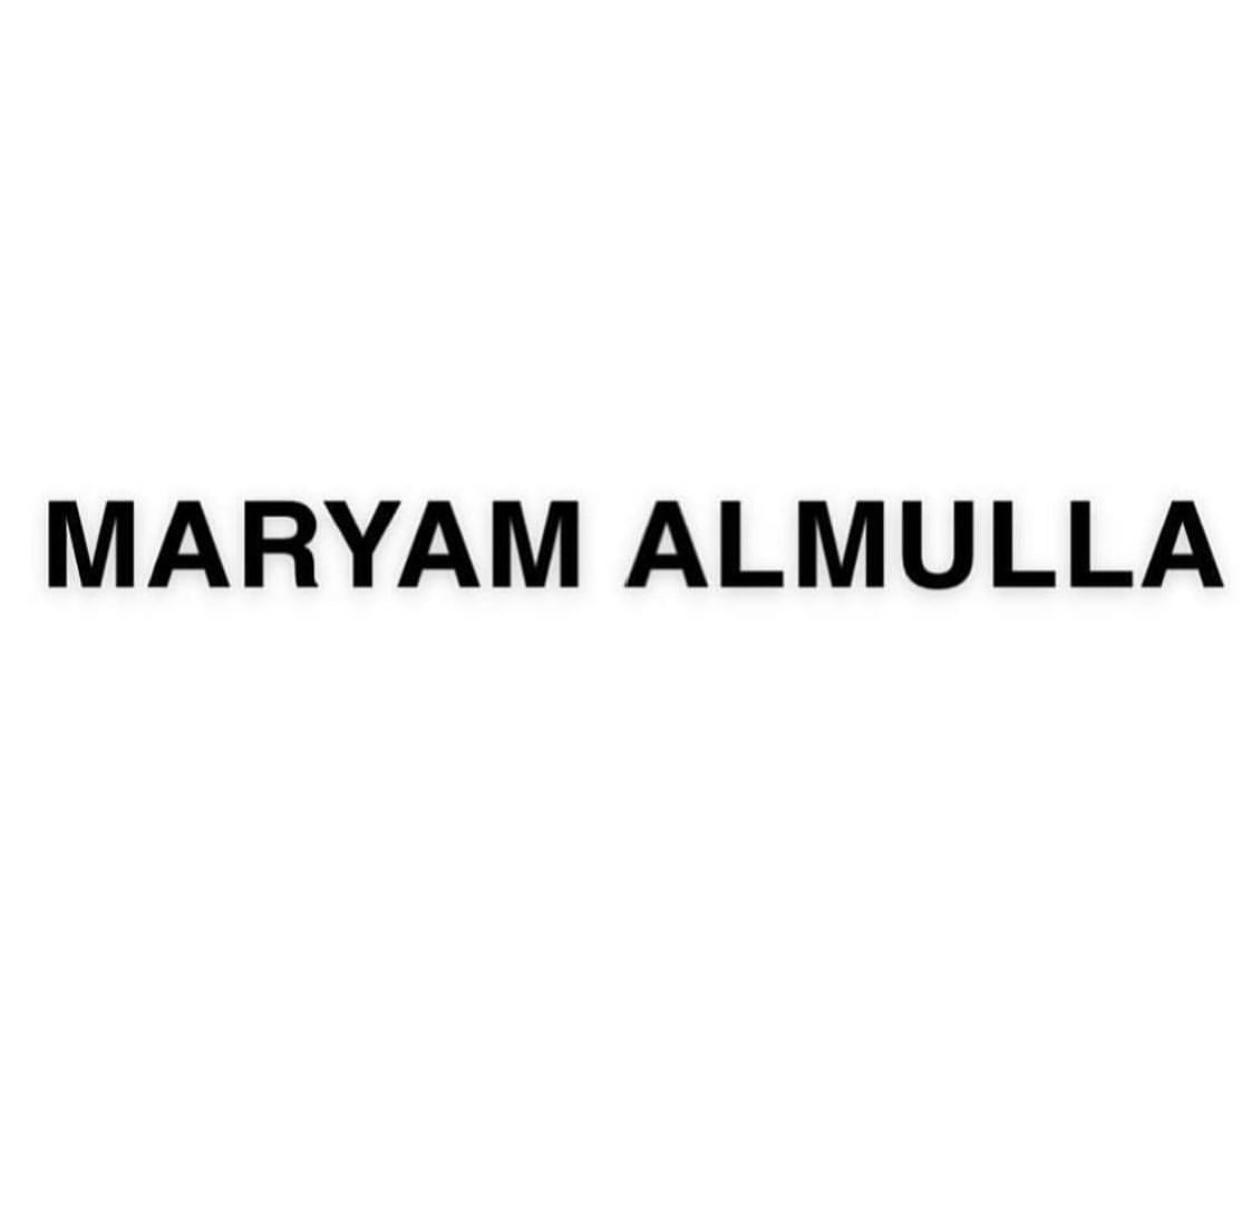 Maryam Almulla